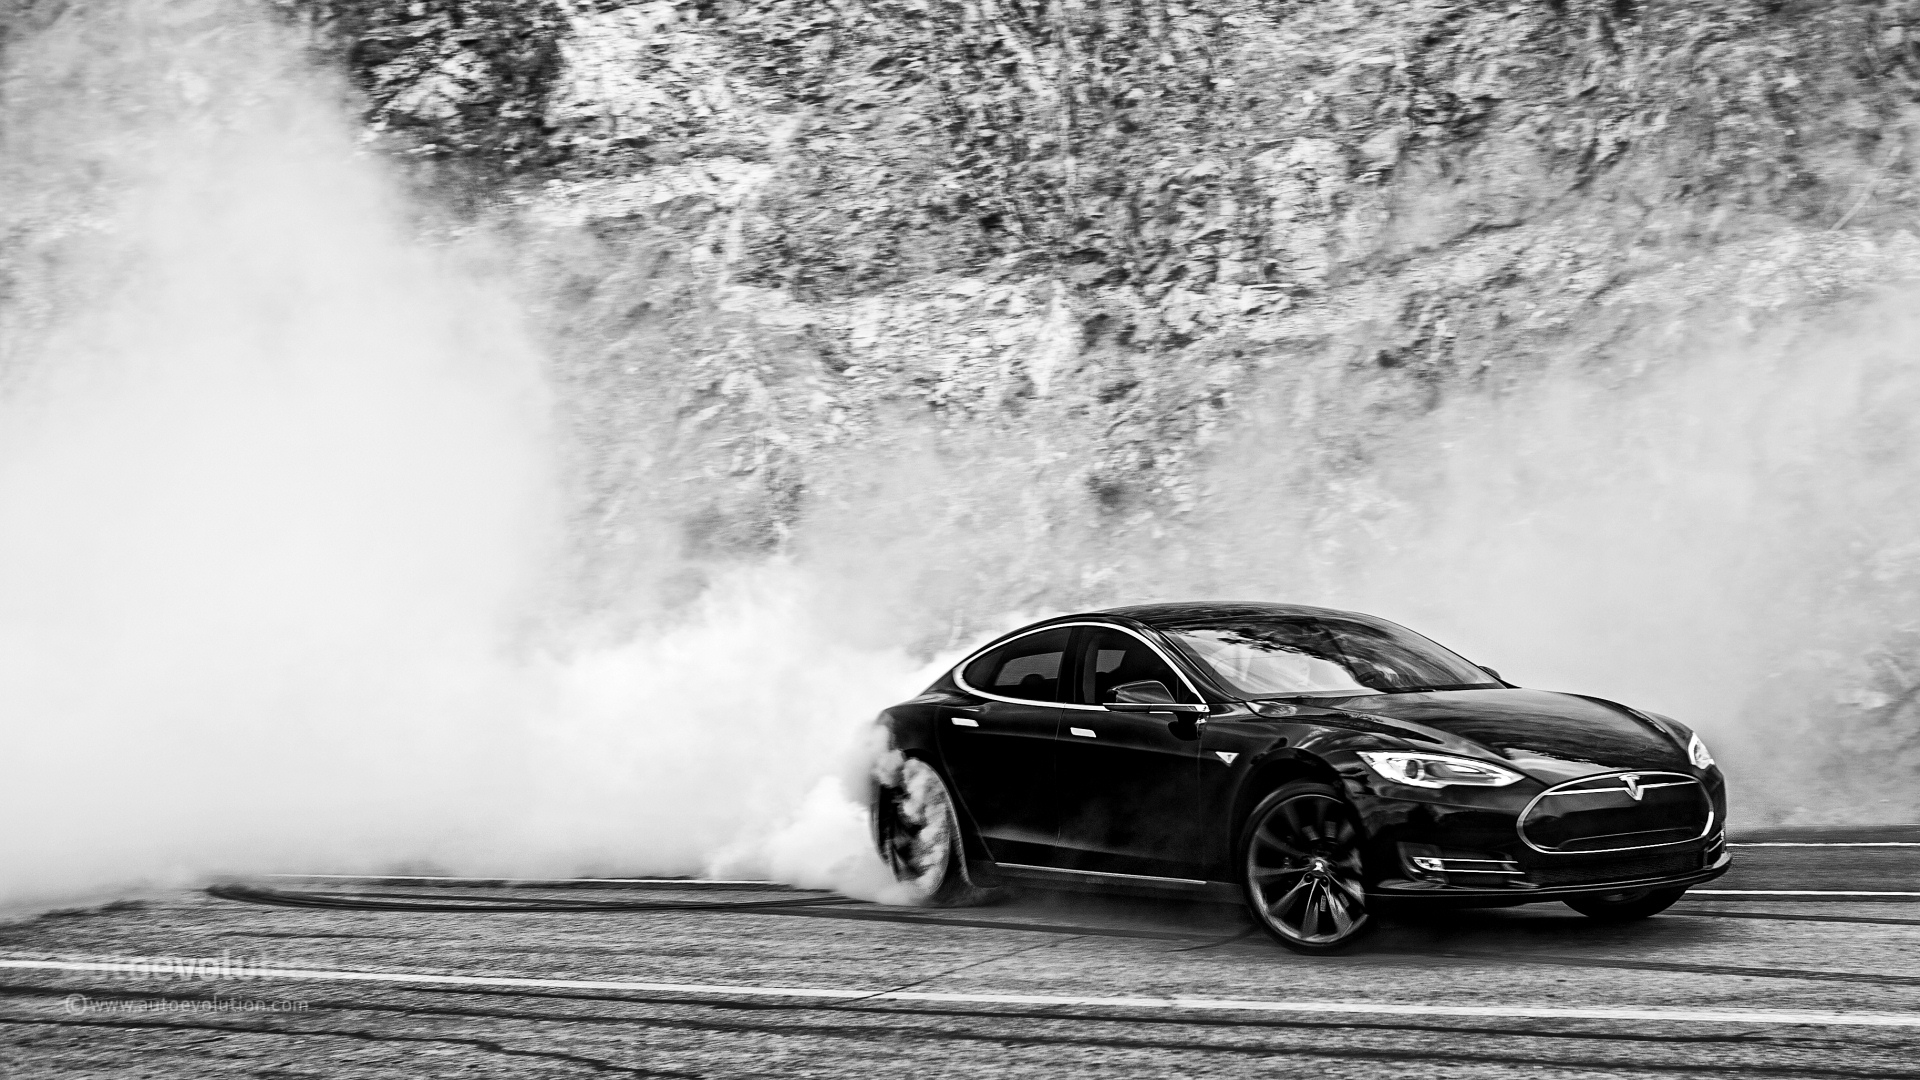 Tesla Model S Doing Monster Burnouts HD Wallpapers 1920x1080